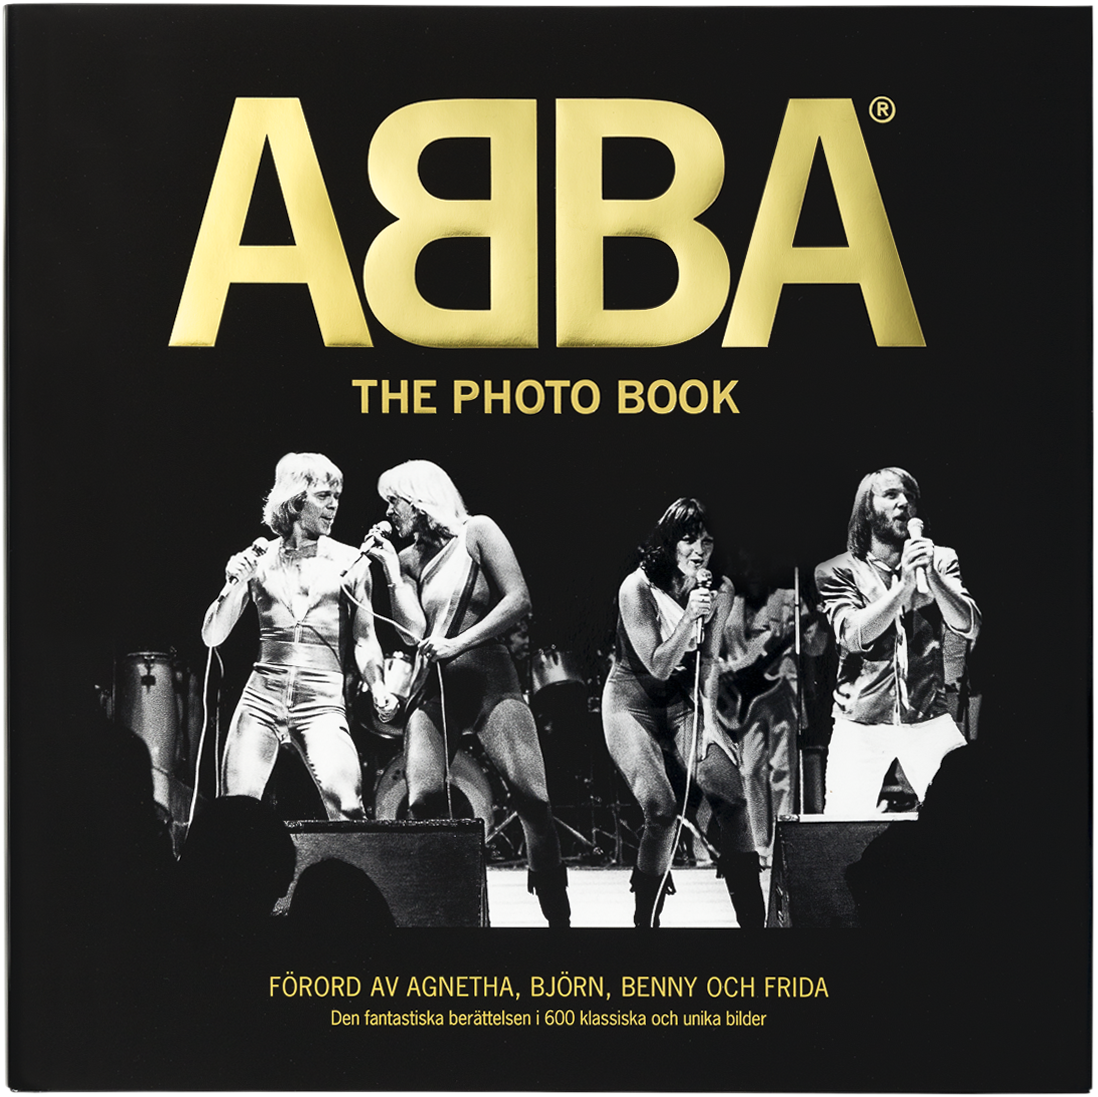 ABBA The photo book